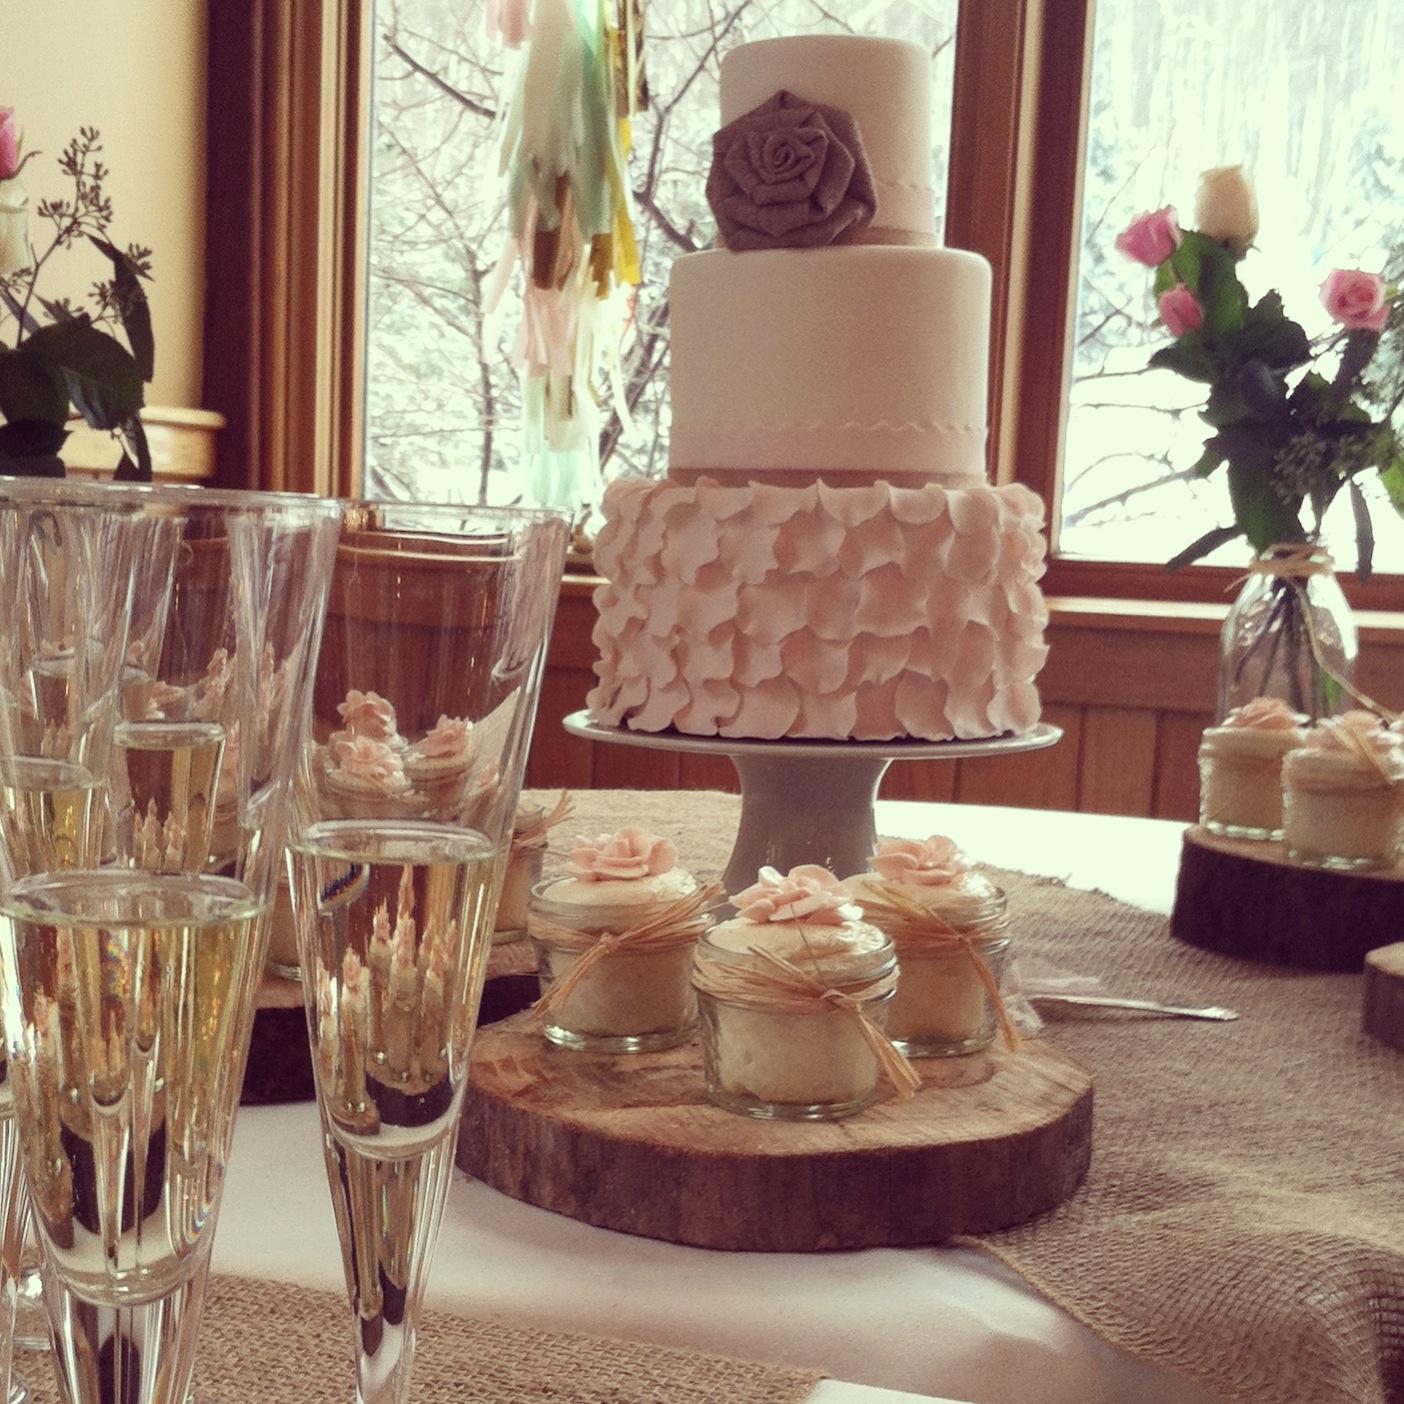 Lola Pearl Bake Shoppe Rustic Elegance Wedding Cake